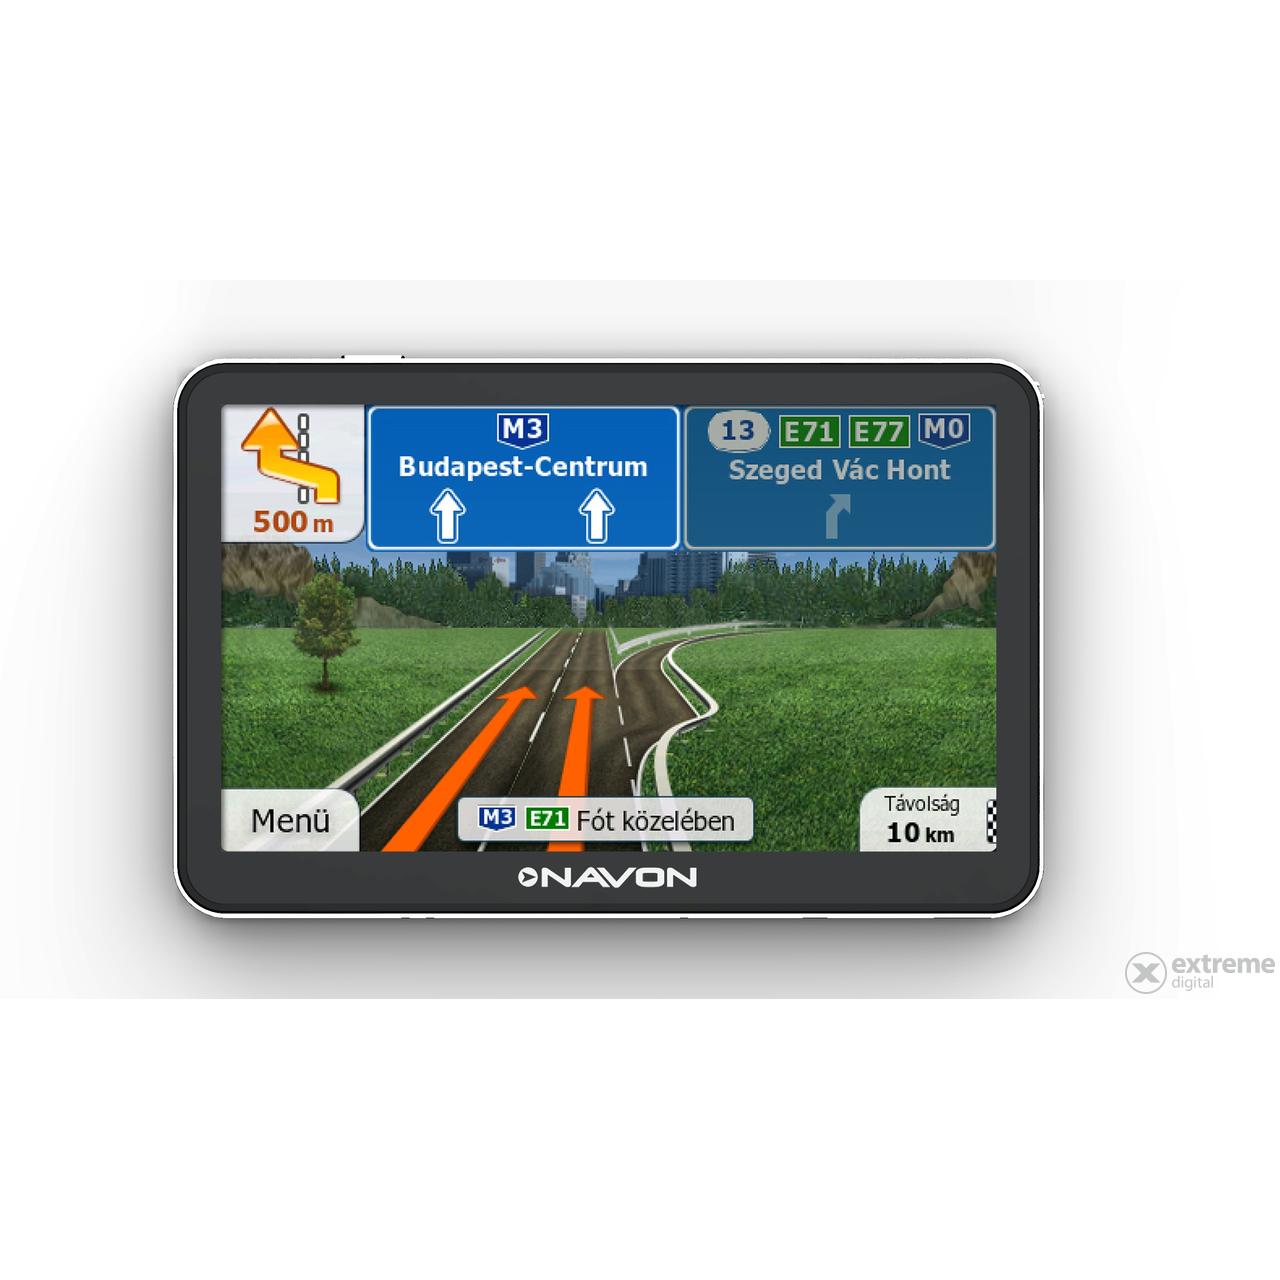 európa térkép gps re Navon N670 Plus navigáció + iGO Primo Teljes Európa térkép (45  európa térkép gps re